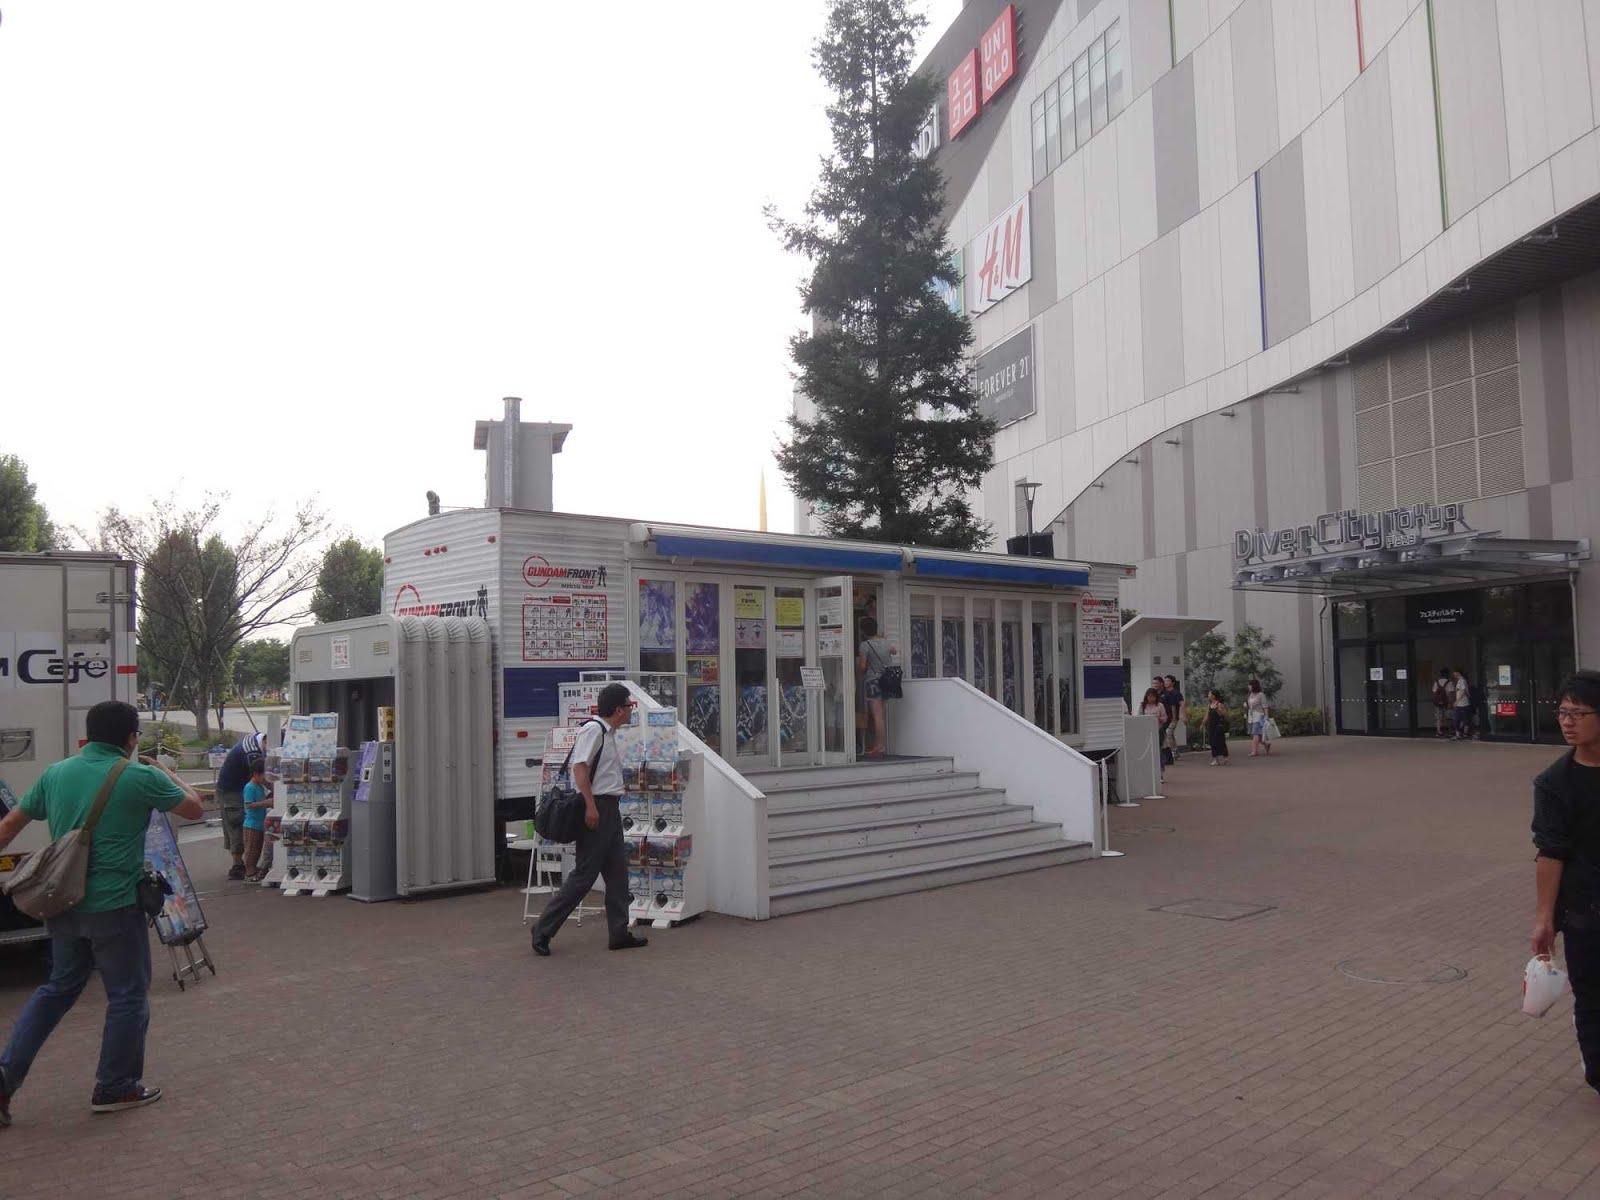 2014-07-24-C.jpg